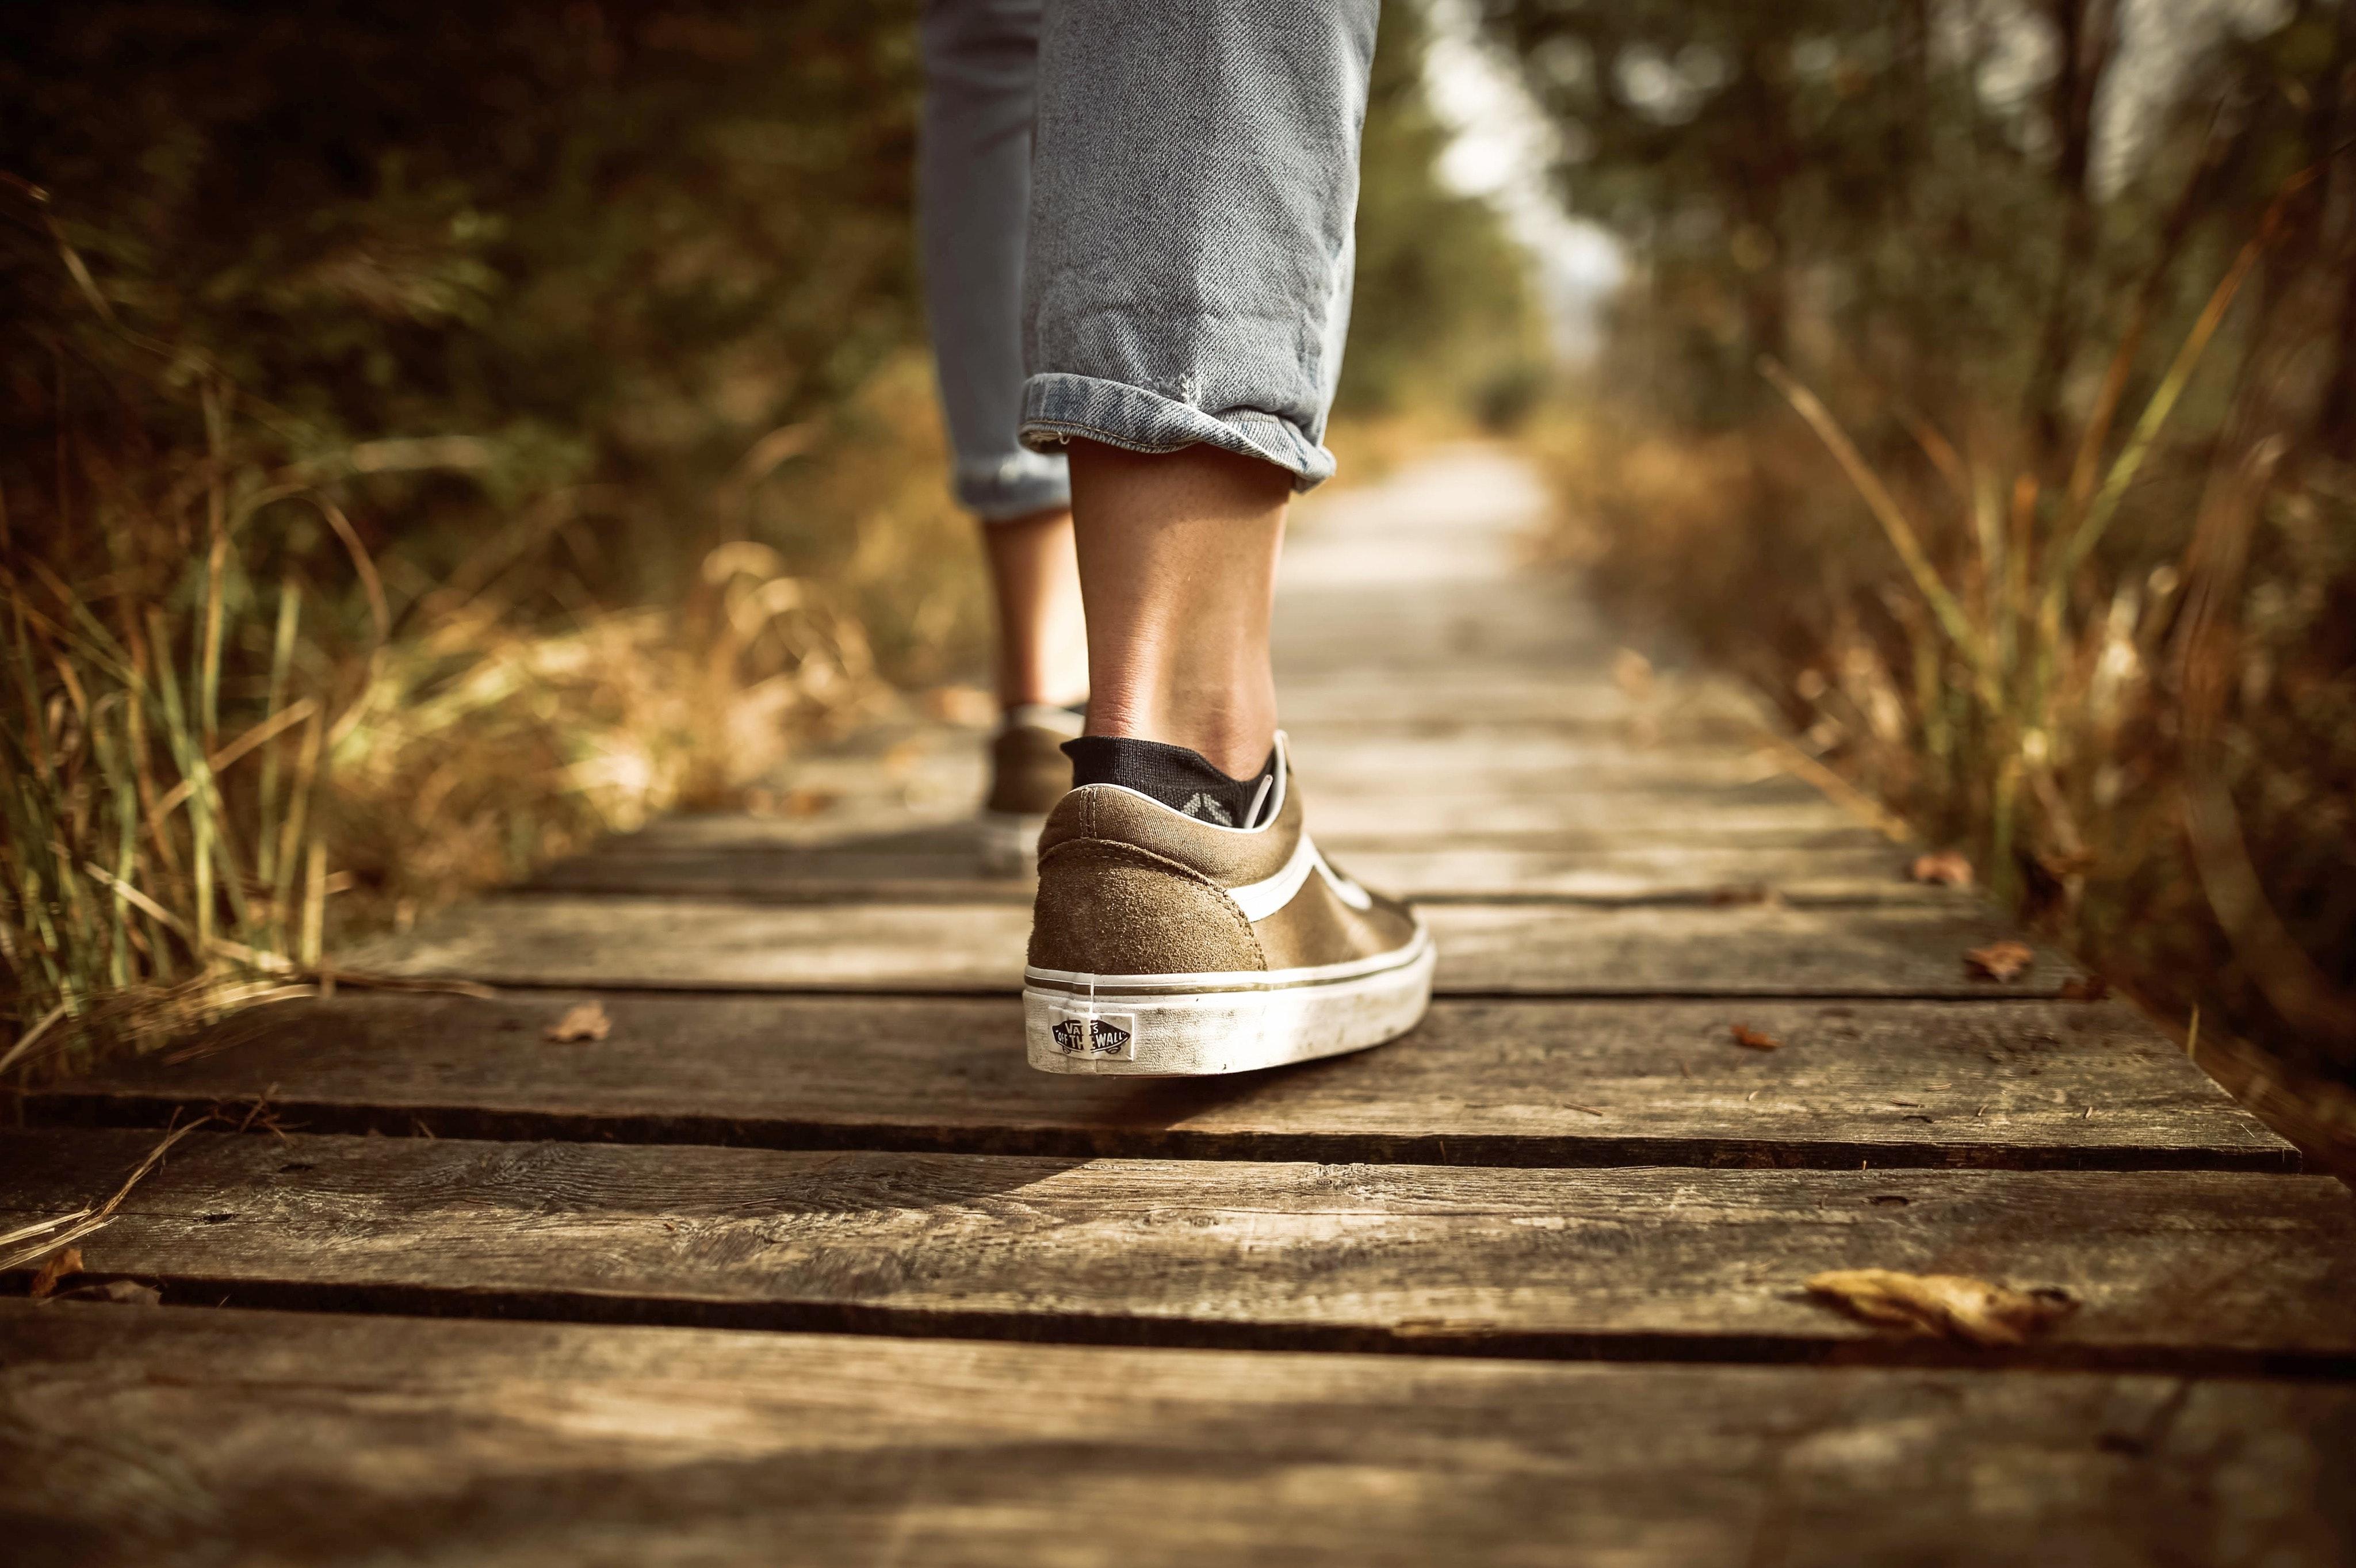 fashion-footwear-grass-outdoors-631986